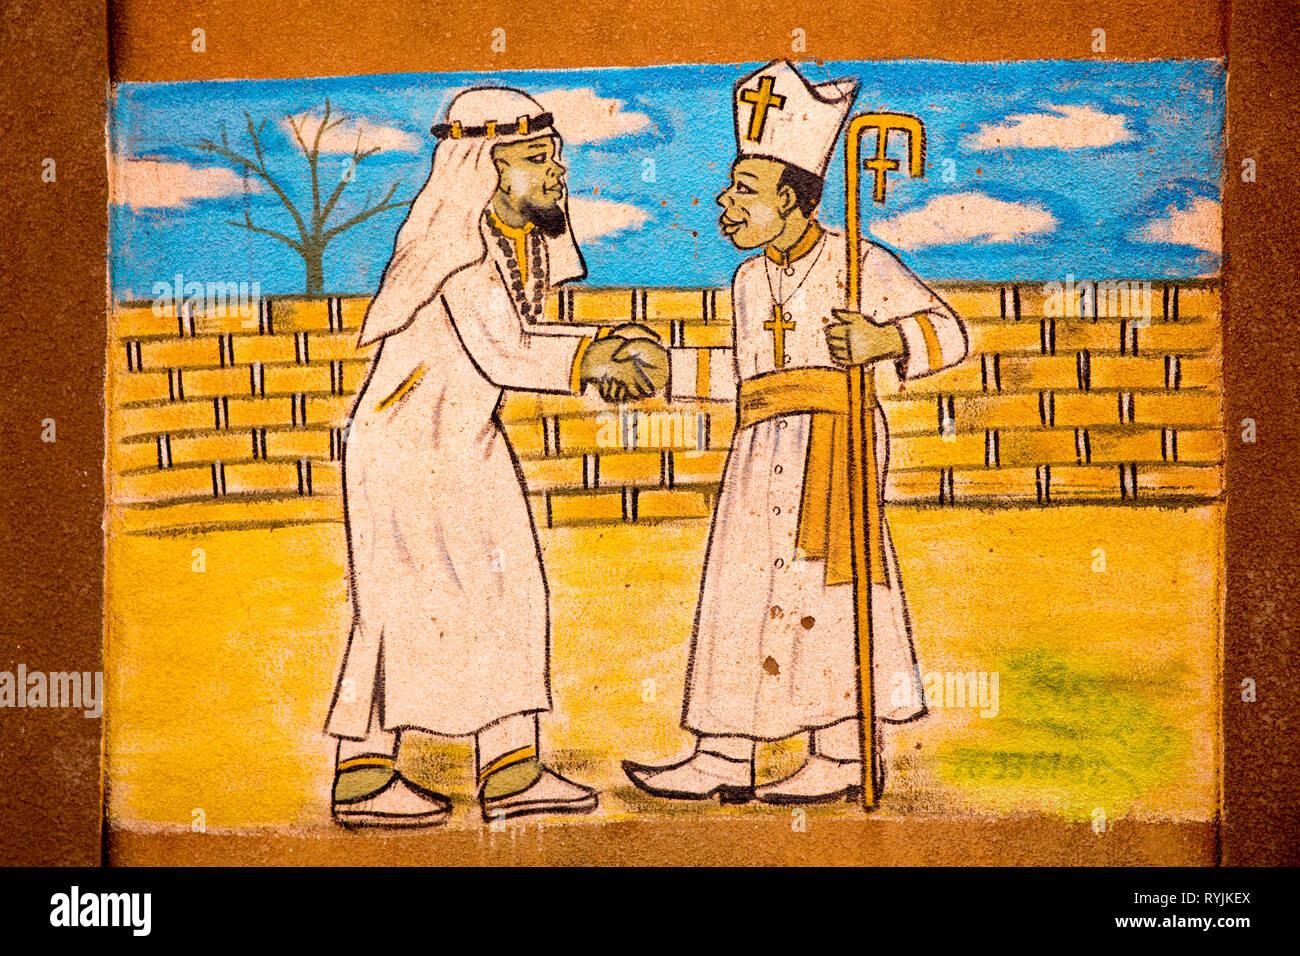 Wall painting advocating religious tolerance in Ouahigouya, Burkina Faso. - Stock Image